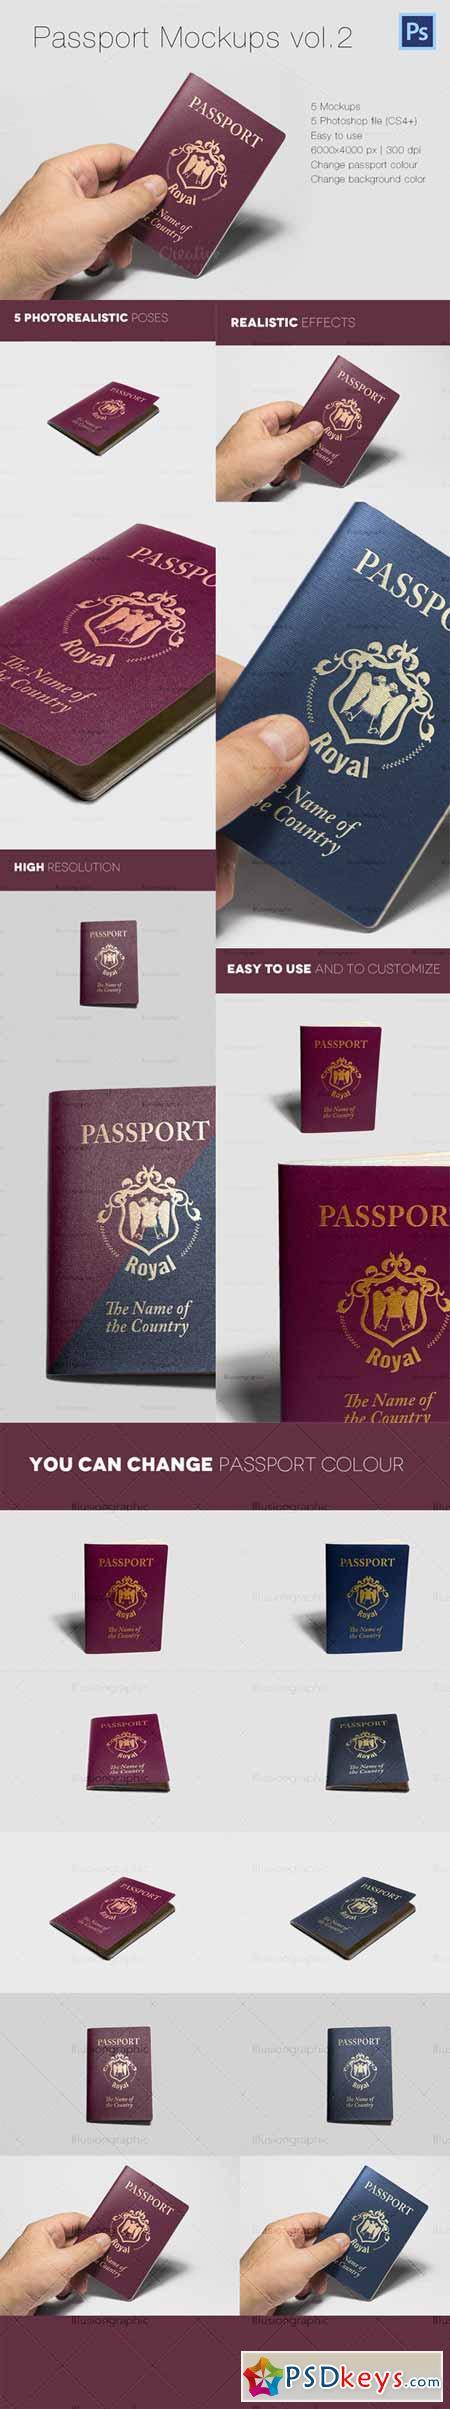 Photorealistic Passport Mockup Vol.2 393370